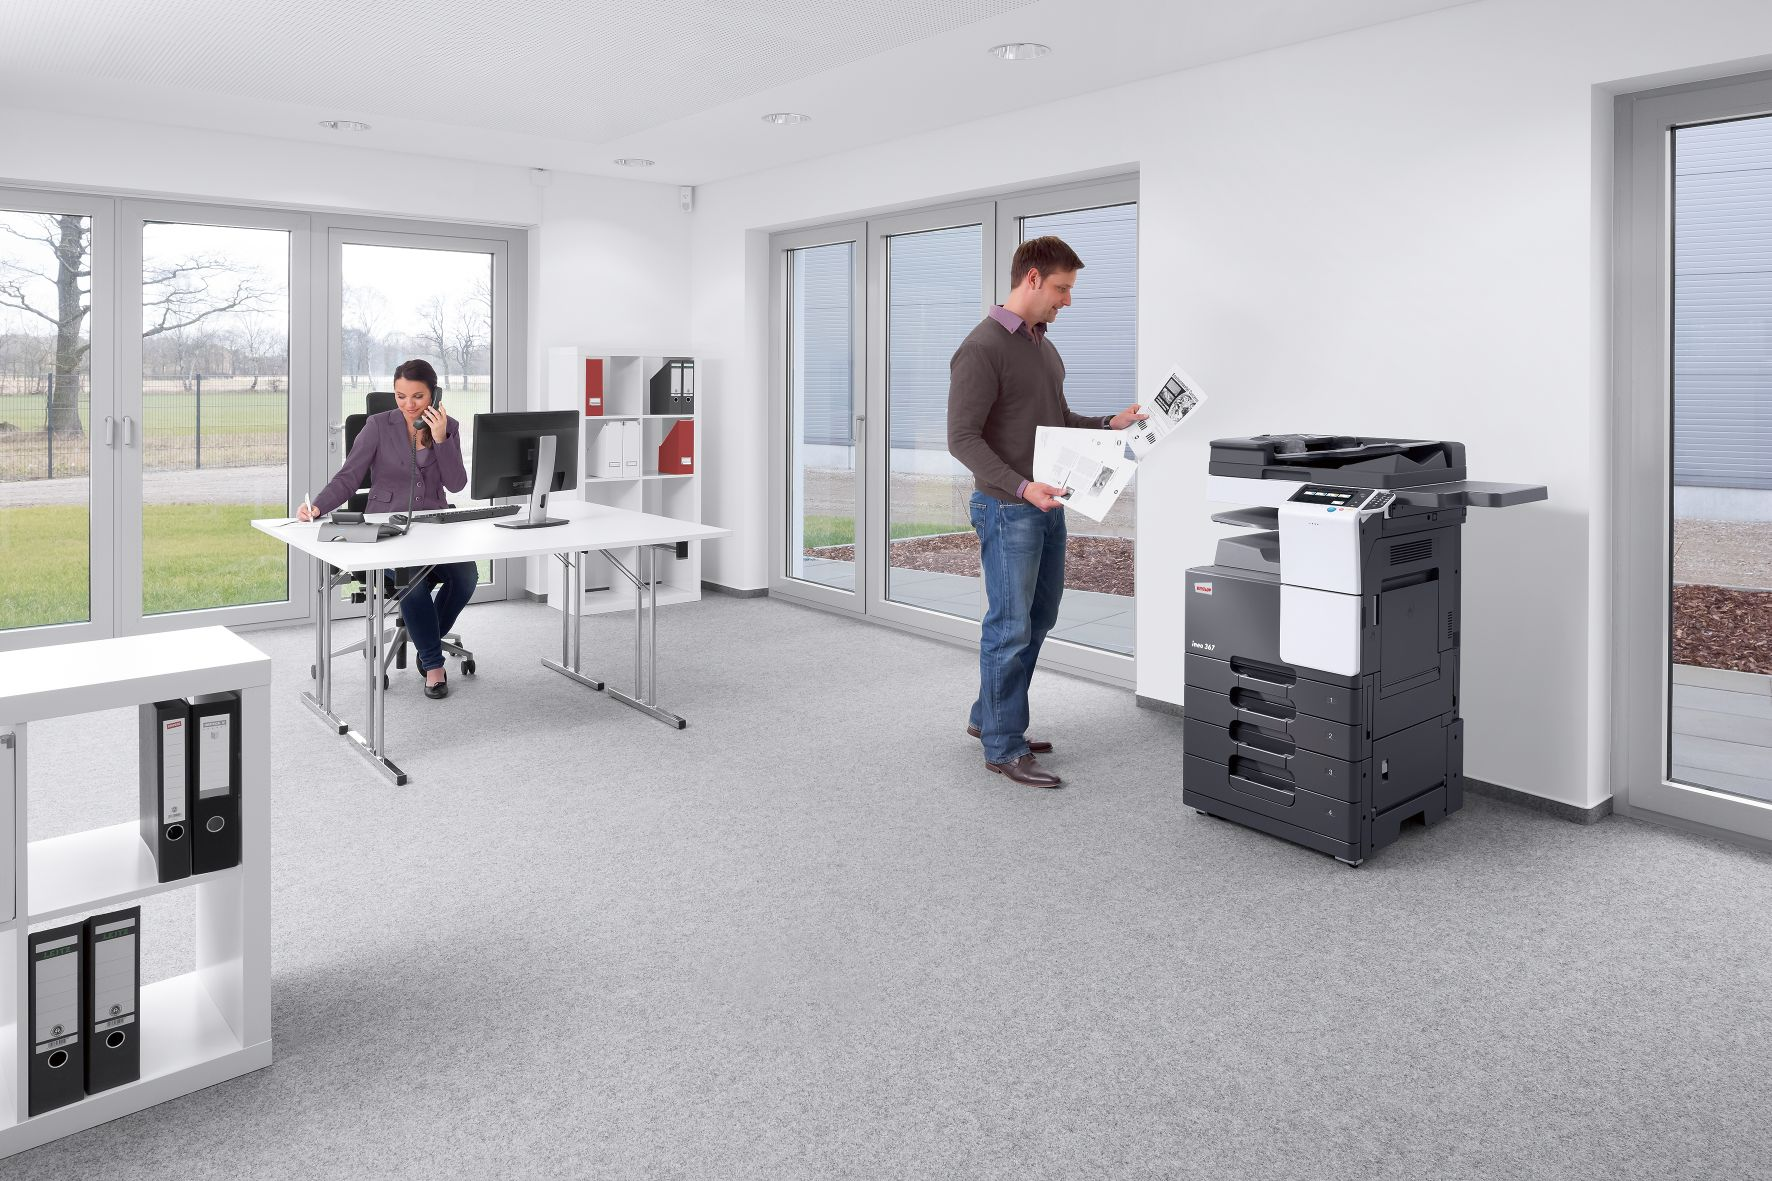 impresora-DEVELOP-oficina